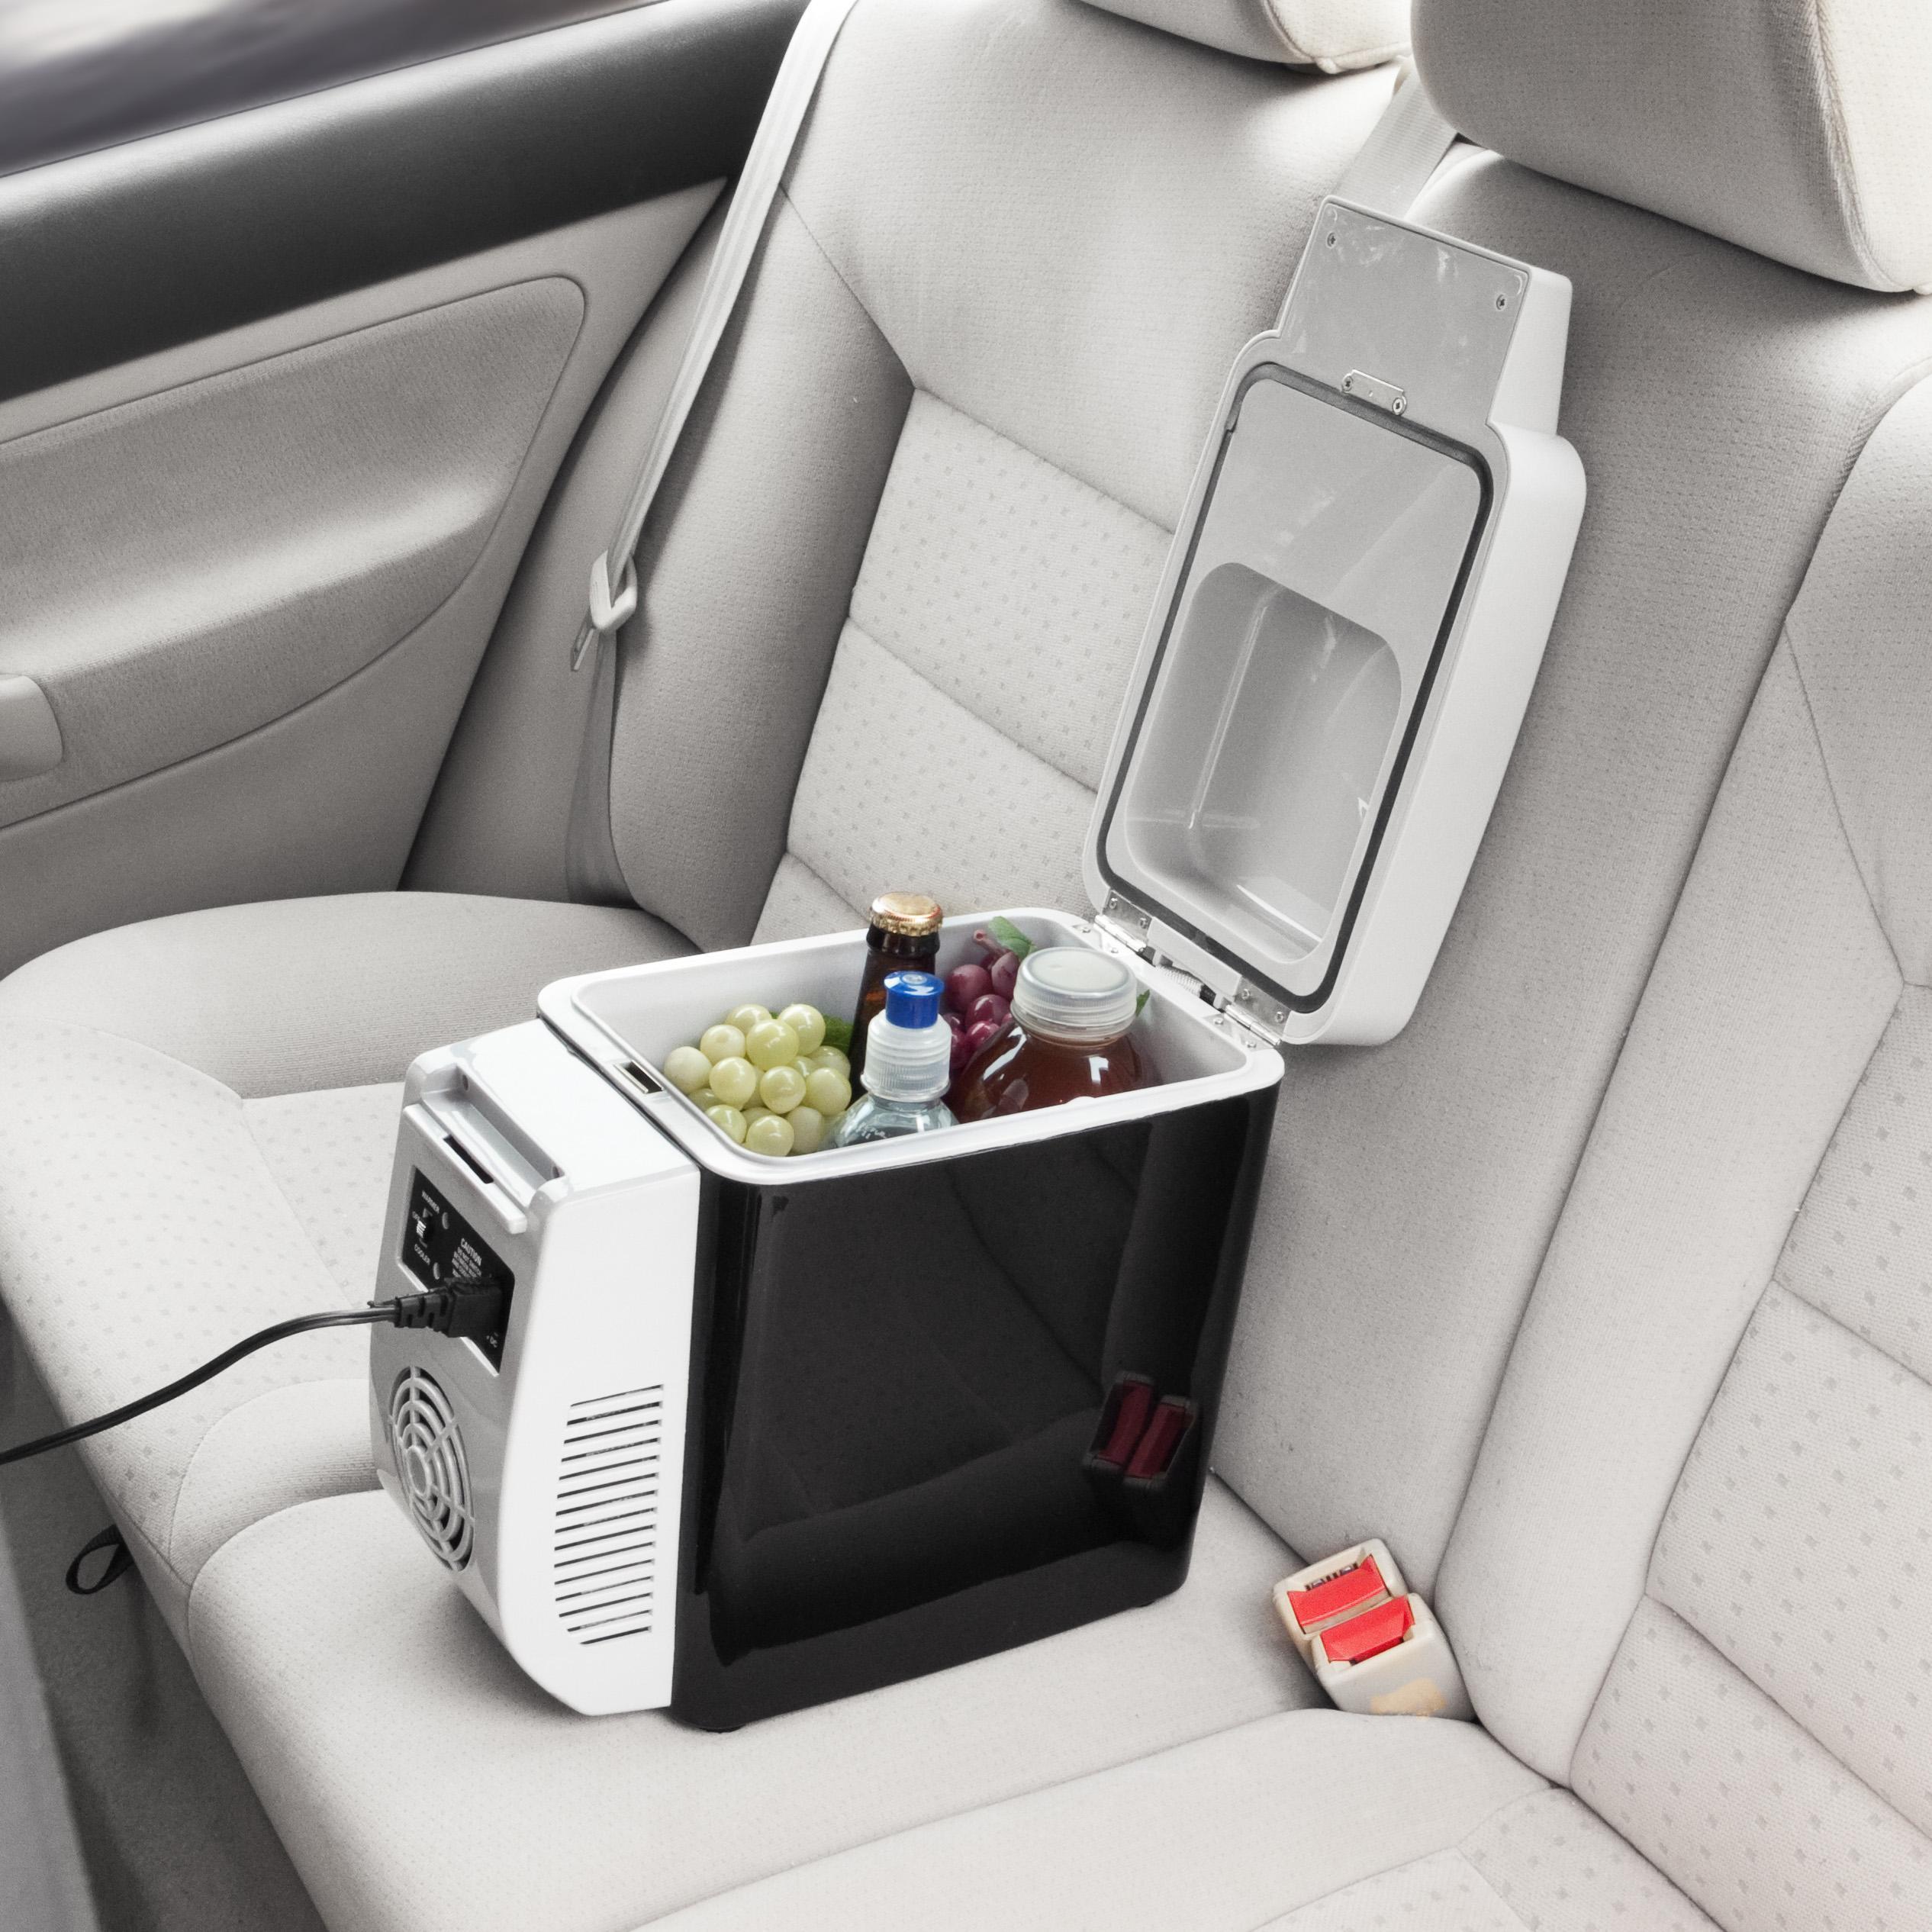 7L Portable Car Freezer Fridge 12V Ice Box Travel Cooler Warmer Car Refrigerator